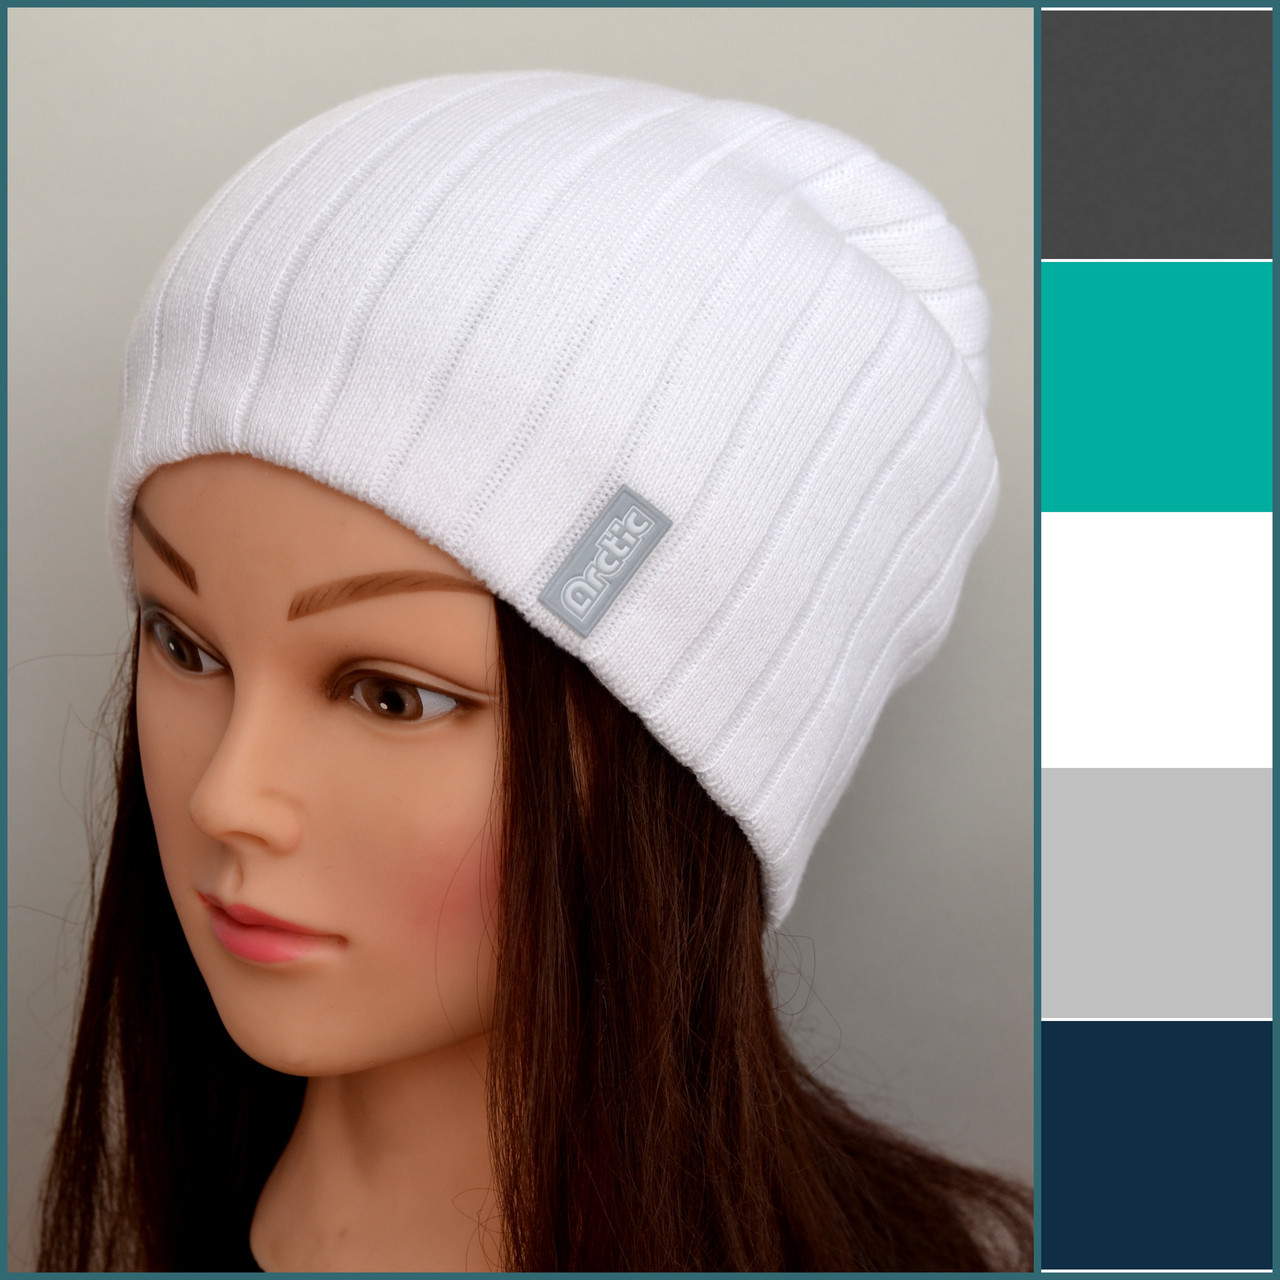 Вязаная весенне осенняя шапка для девушек